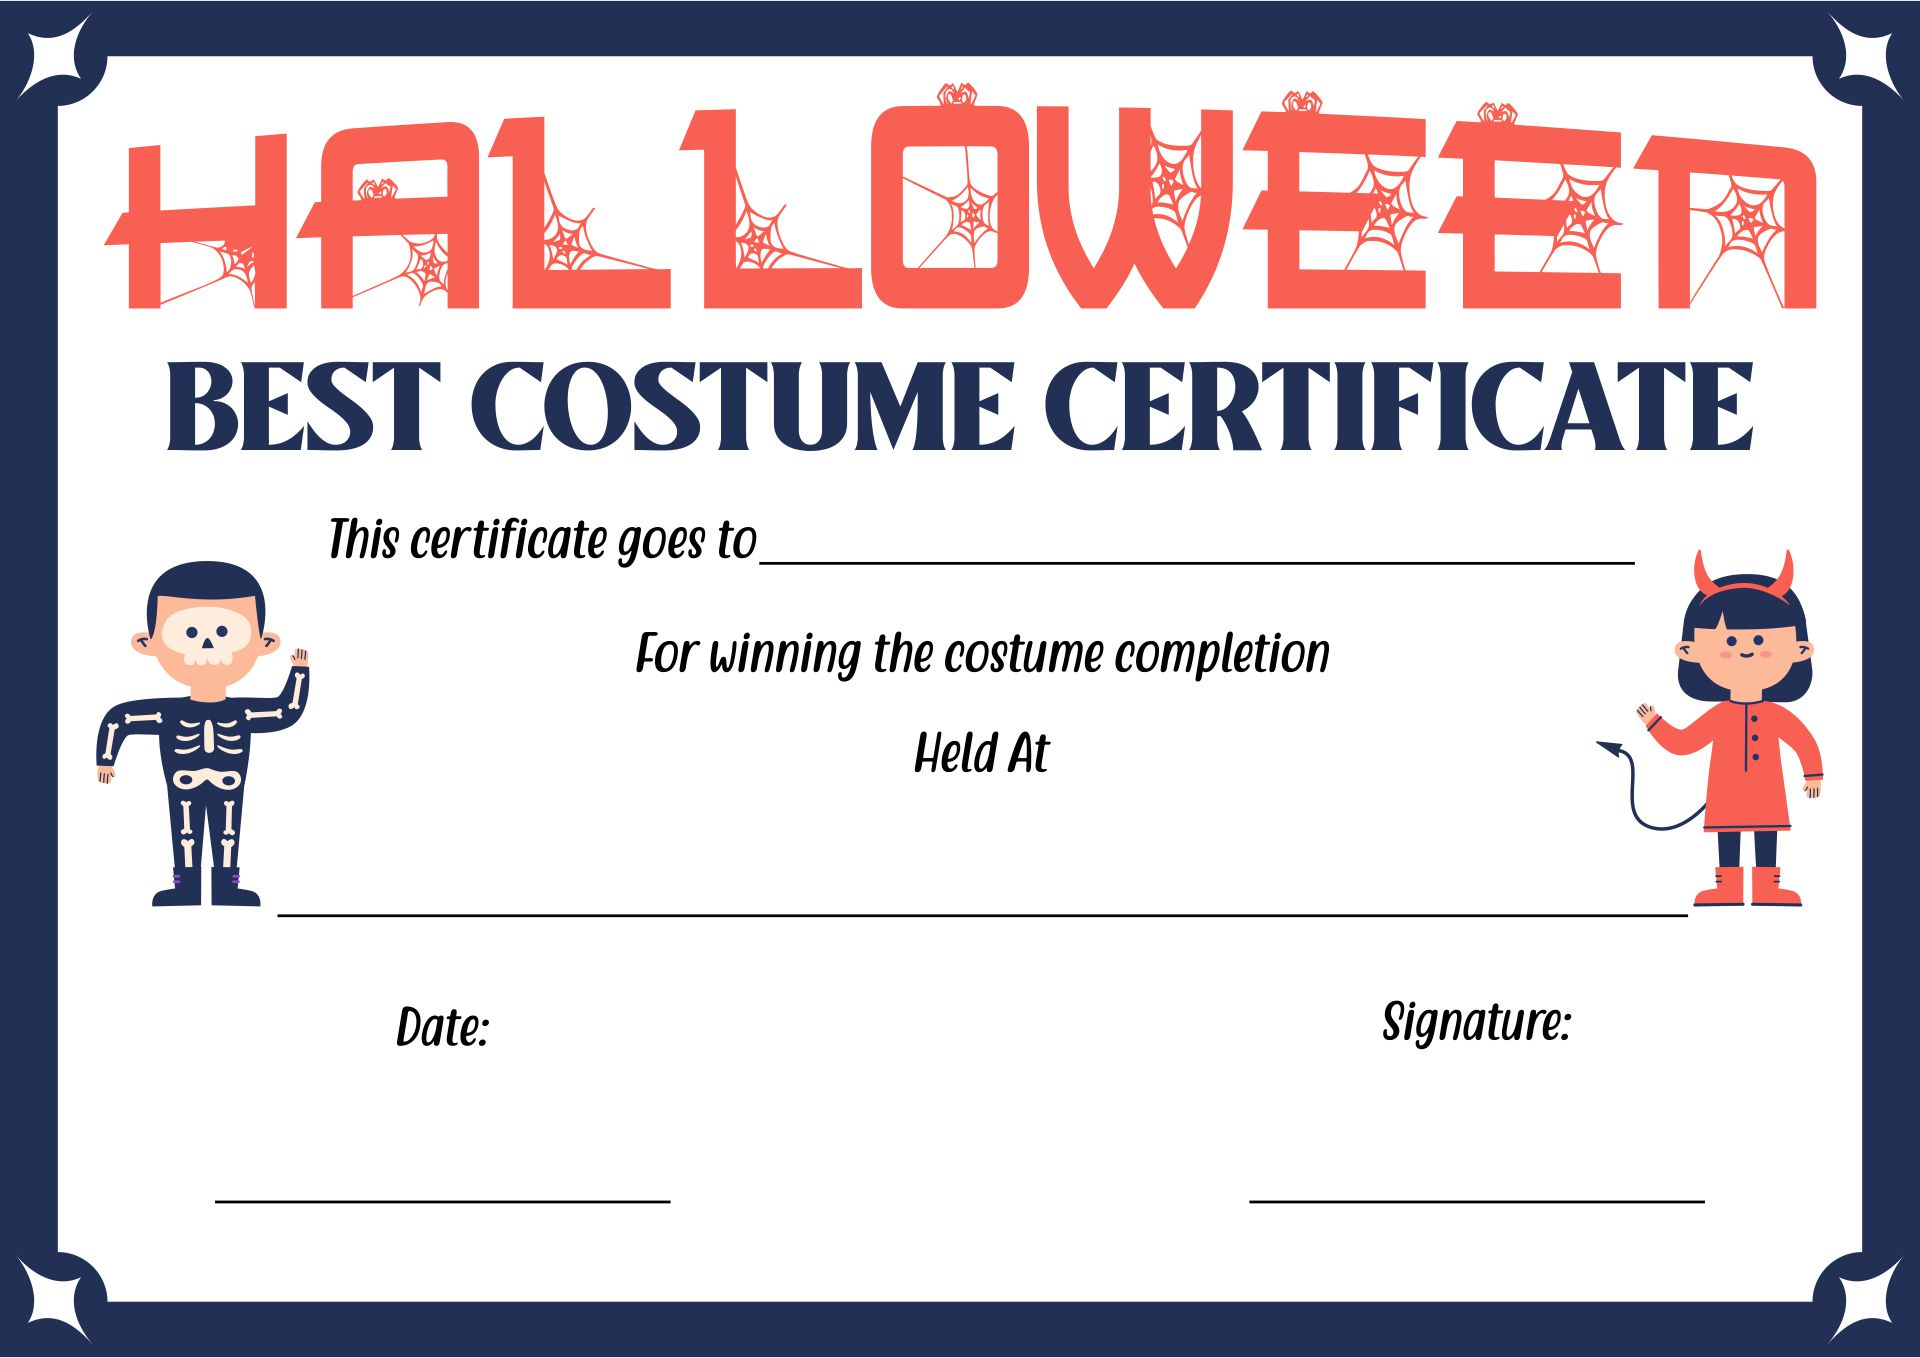 Halloween Costume Contest Certificate Templates